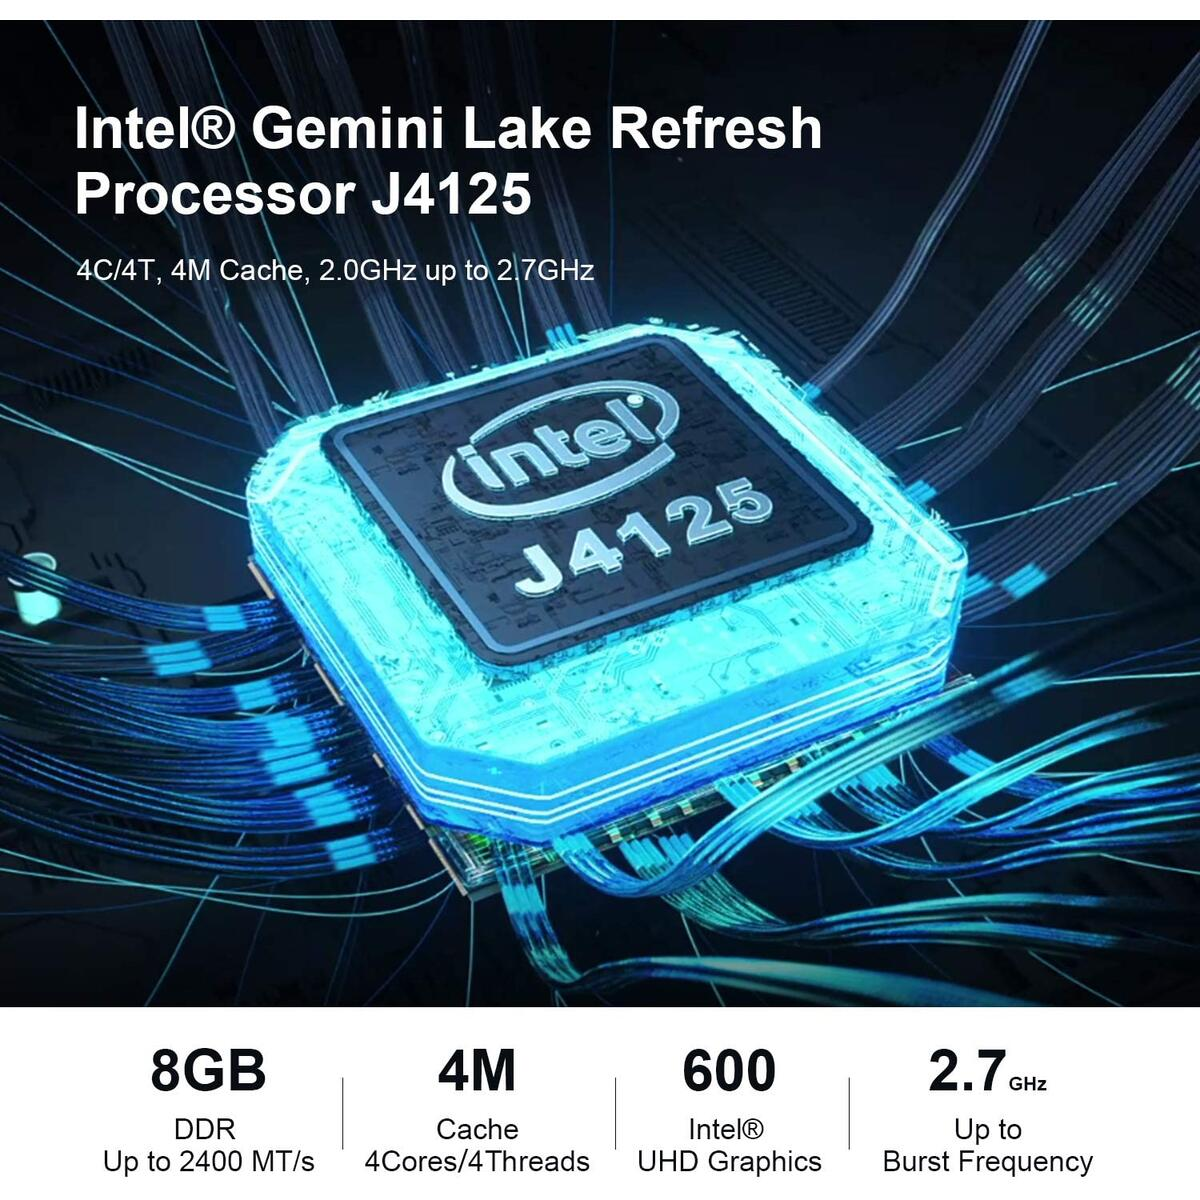 Mini PC Intel Celeron J4125 Windows 10 Pro (up to 2.7GHz) 8GB DDR4/128GB SSD Beelink GK55 Mini Desktop Computer Support Dual displays 4K@60hz HDMI, WiFi, Gigabit Ethernet (8GB+128GB/Celeron J4125)